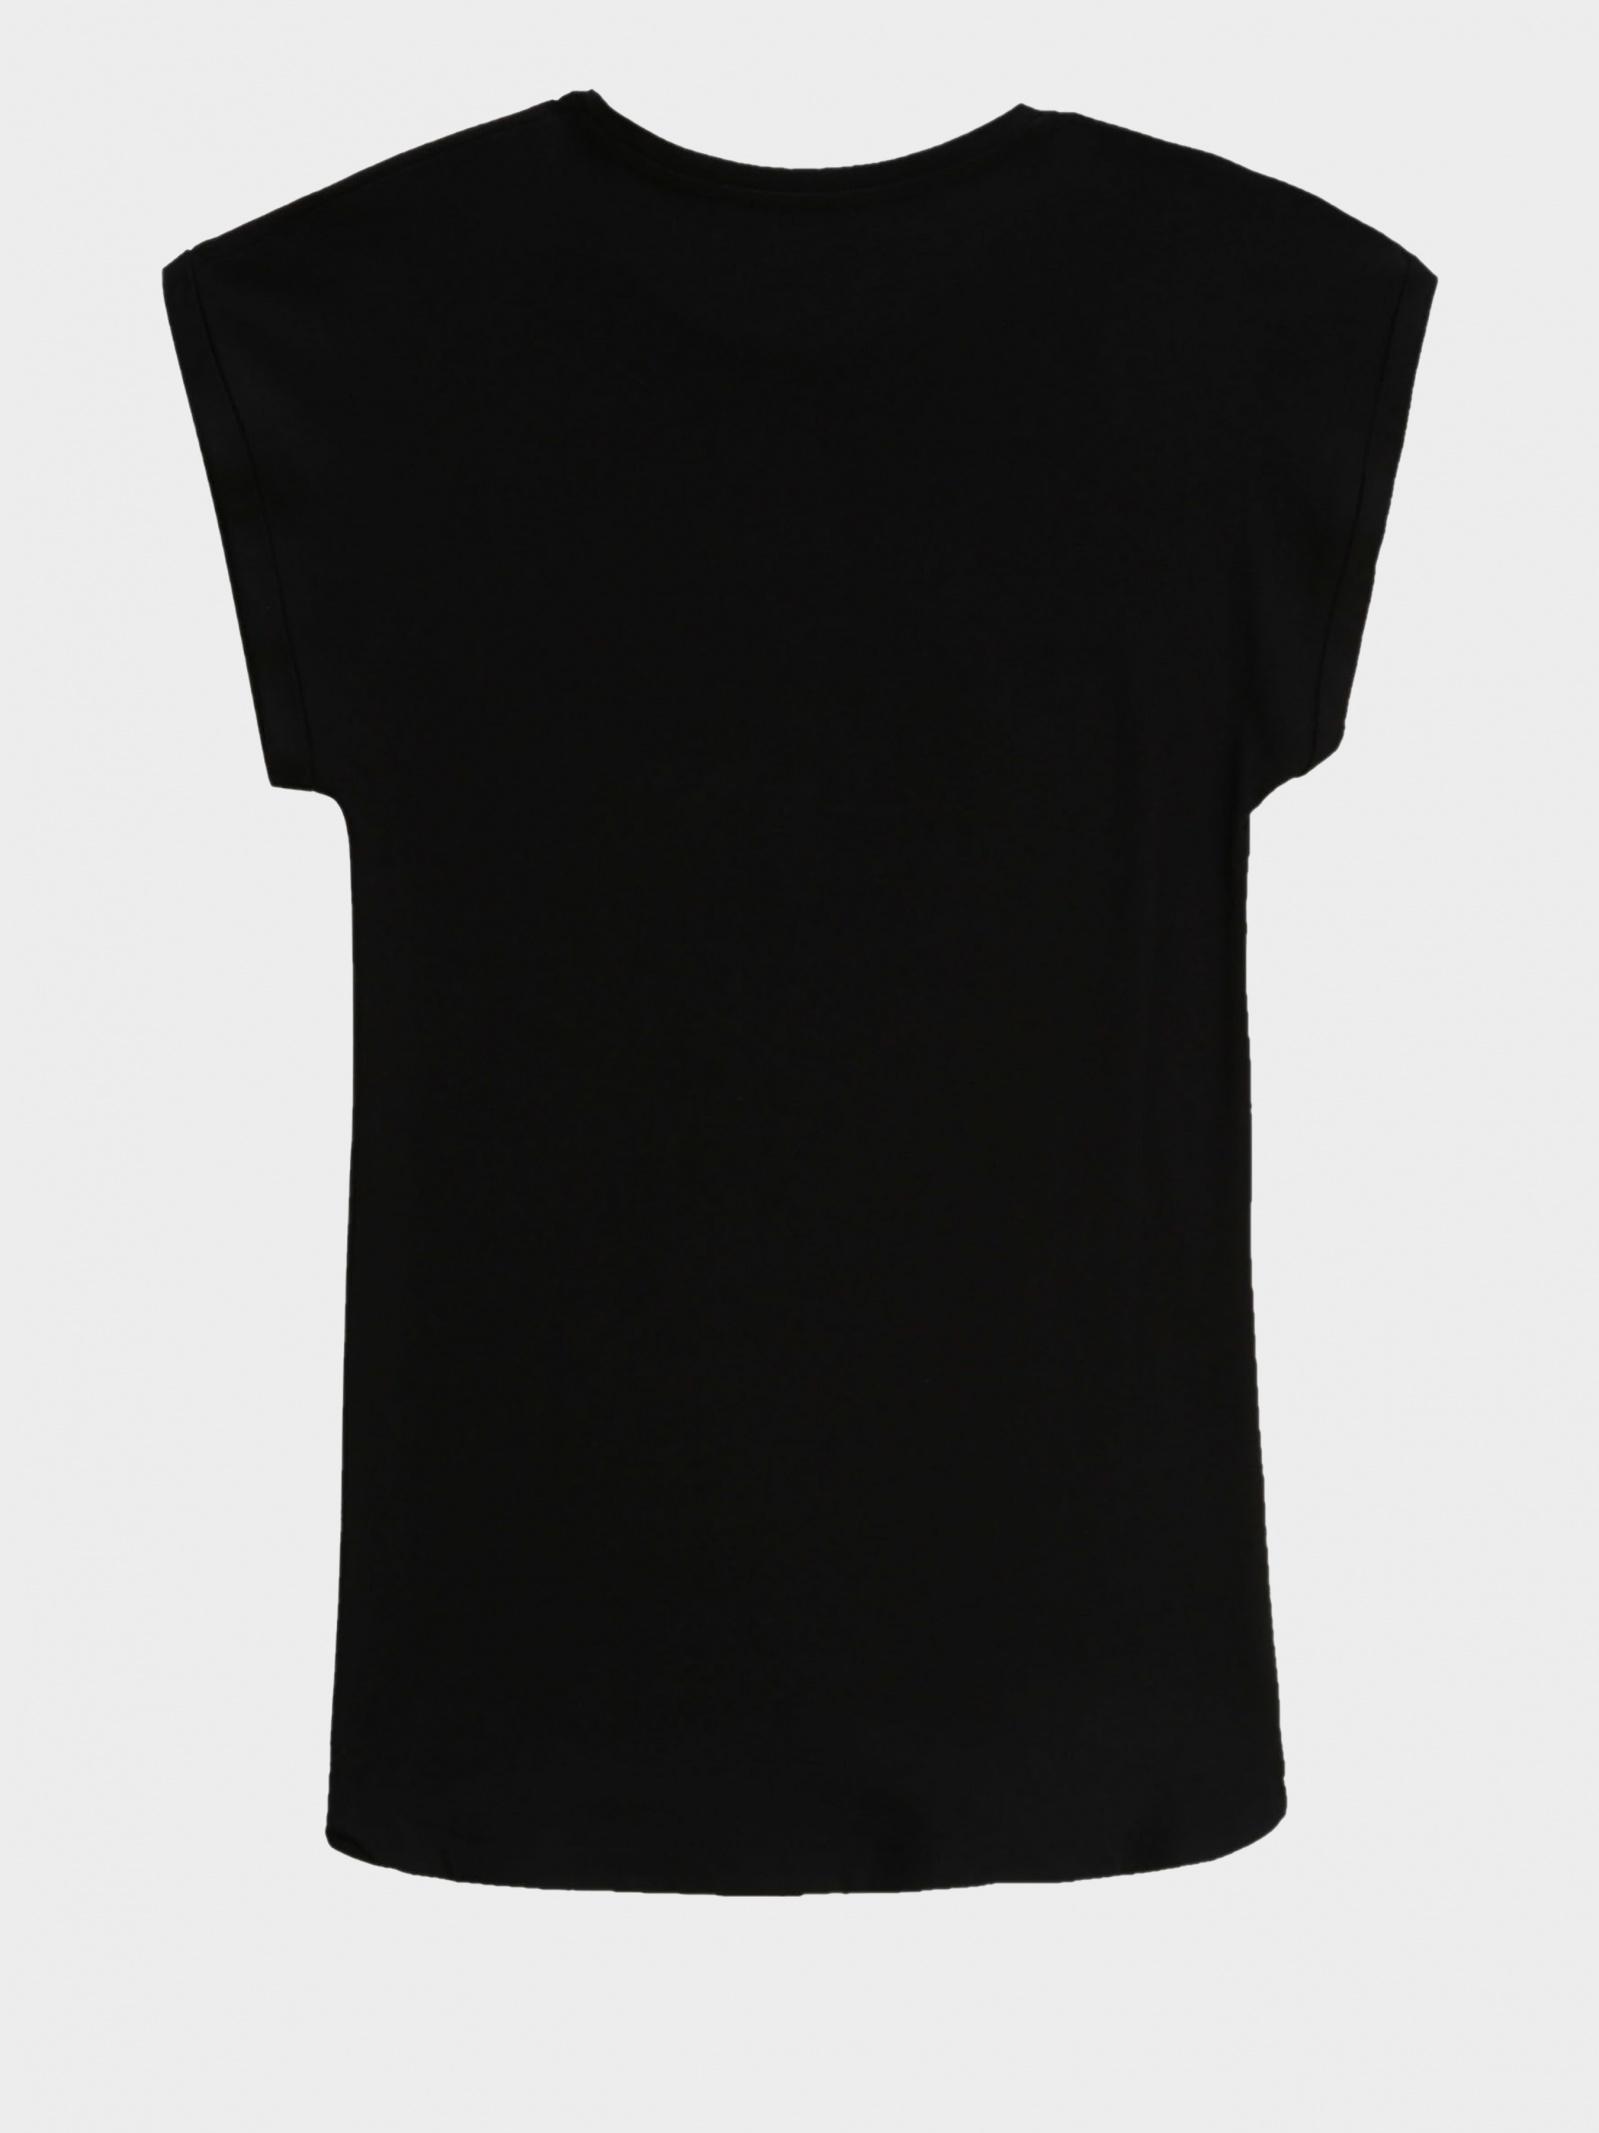 Платье детские KARL LAGERFELD модель HR235 отзывы, 2017